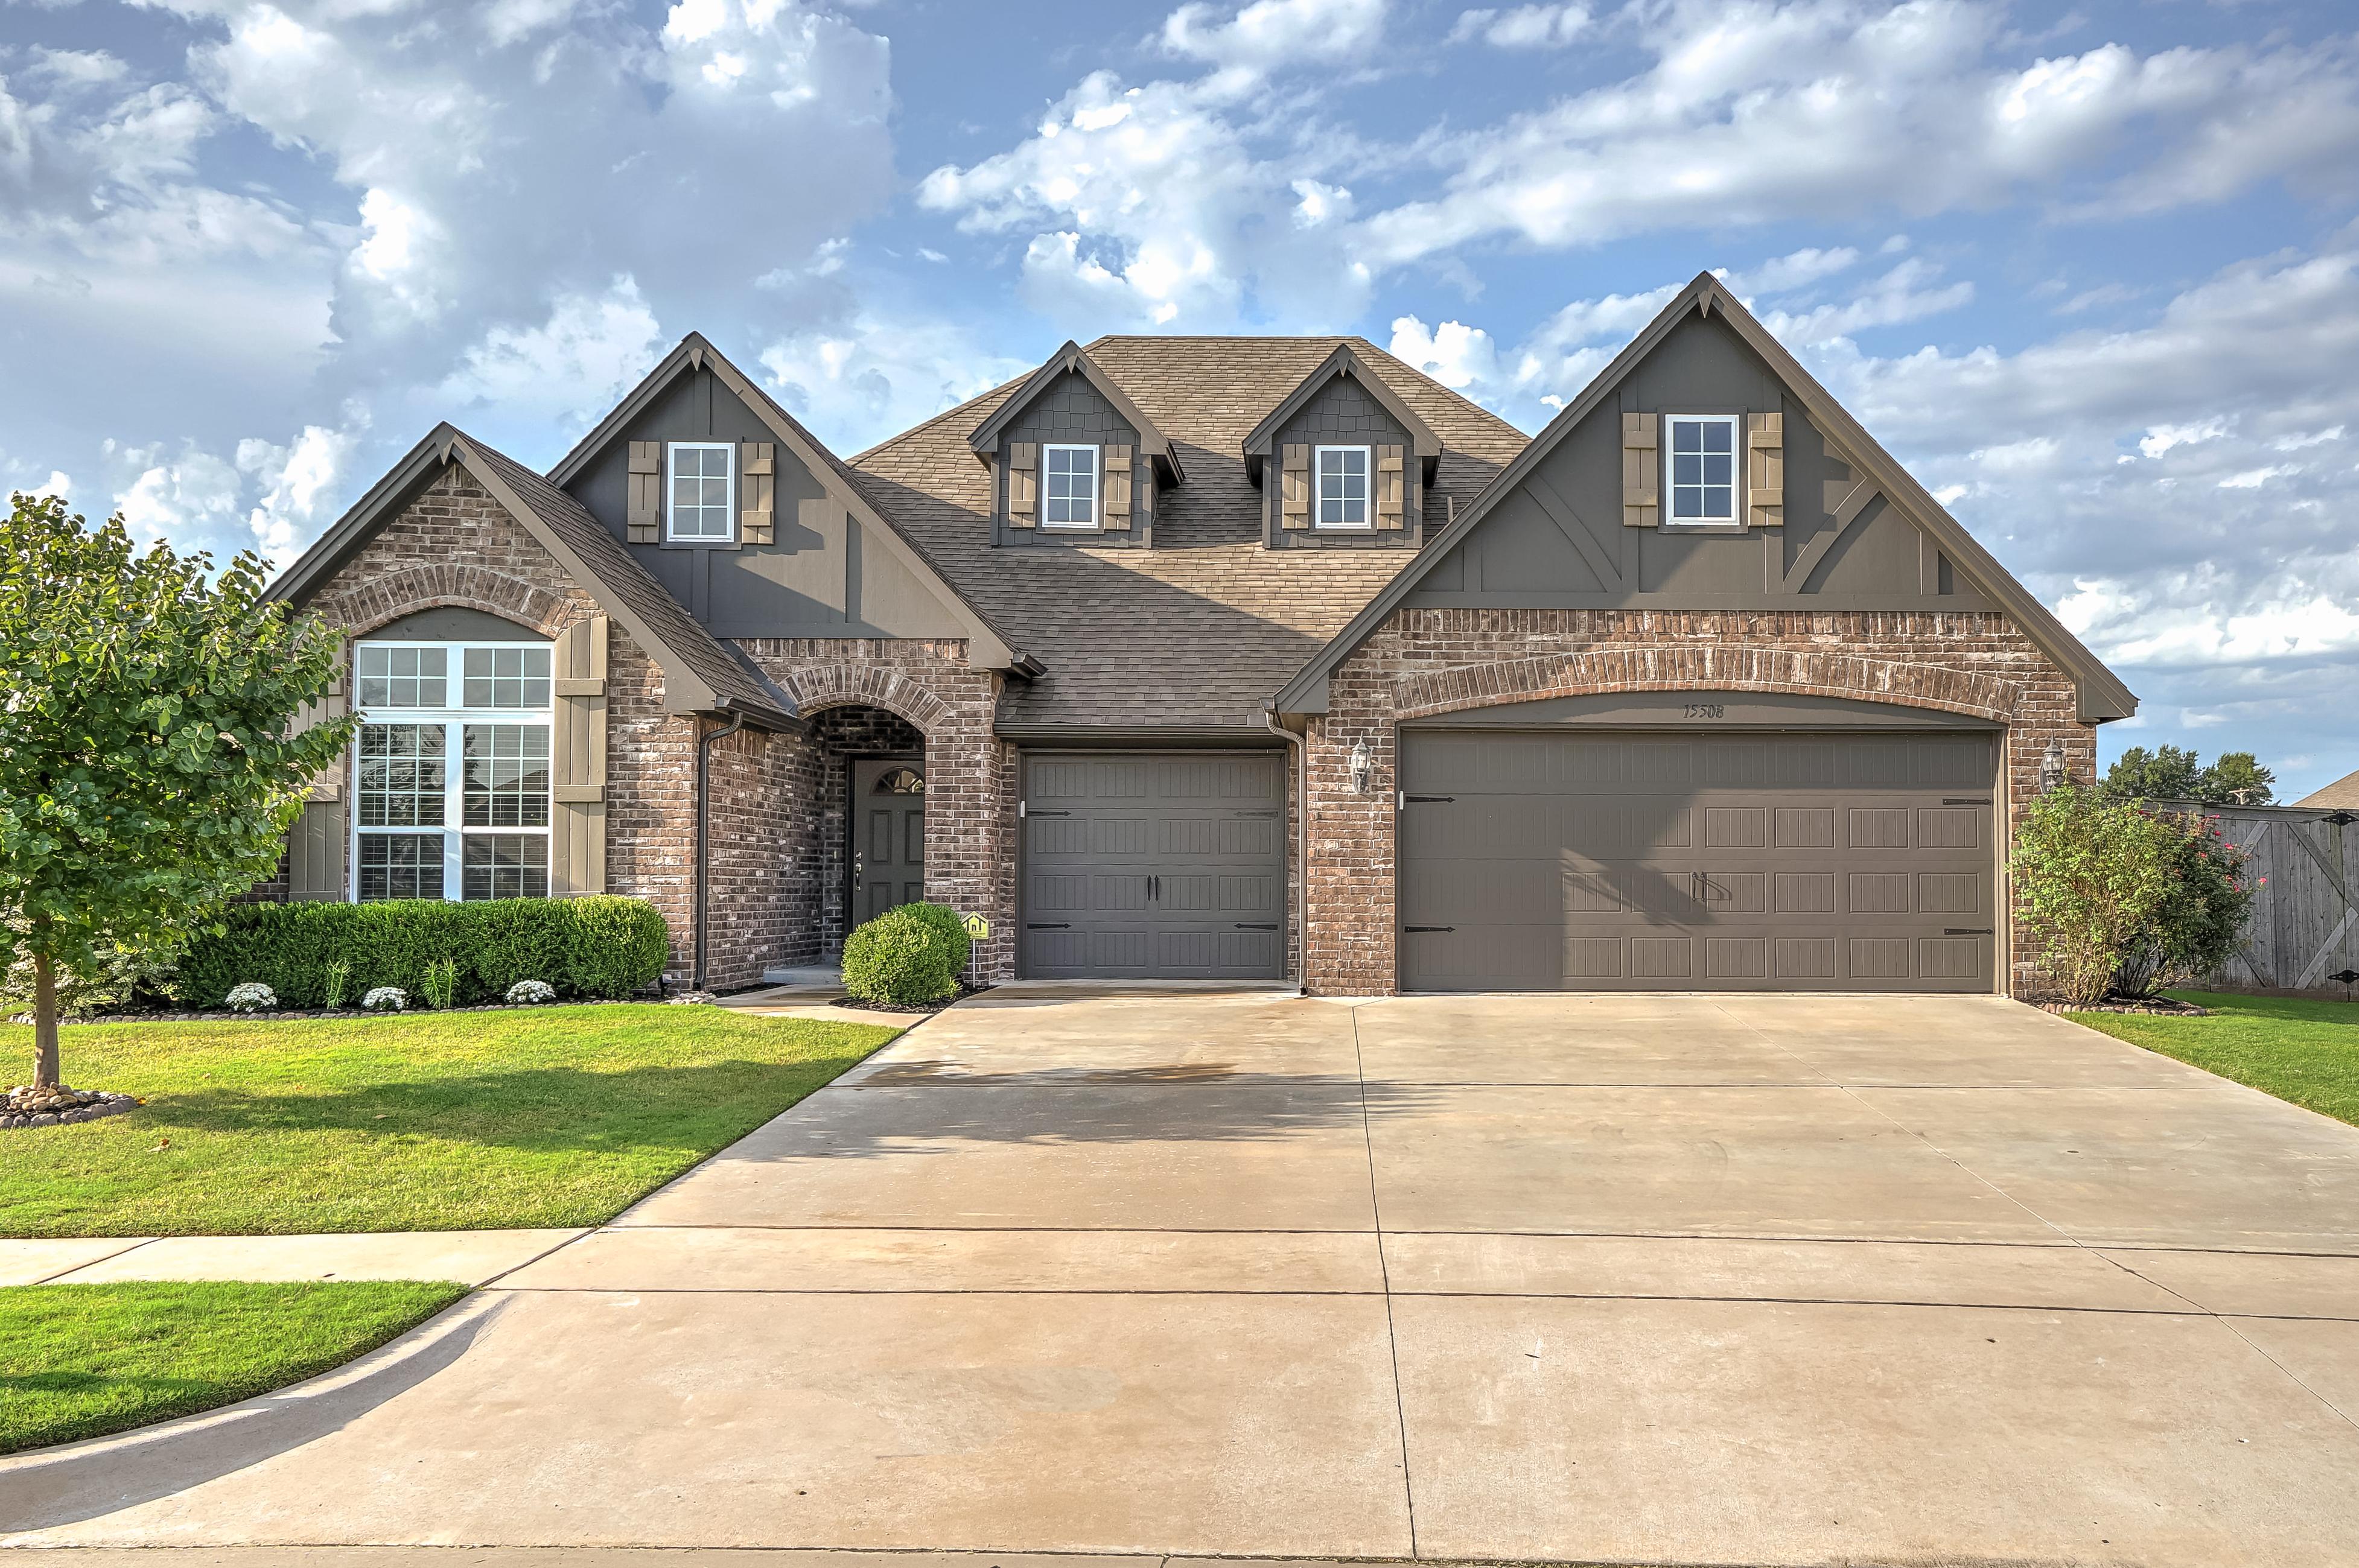 15508 E 87th Place North Property Photo